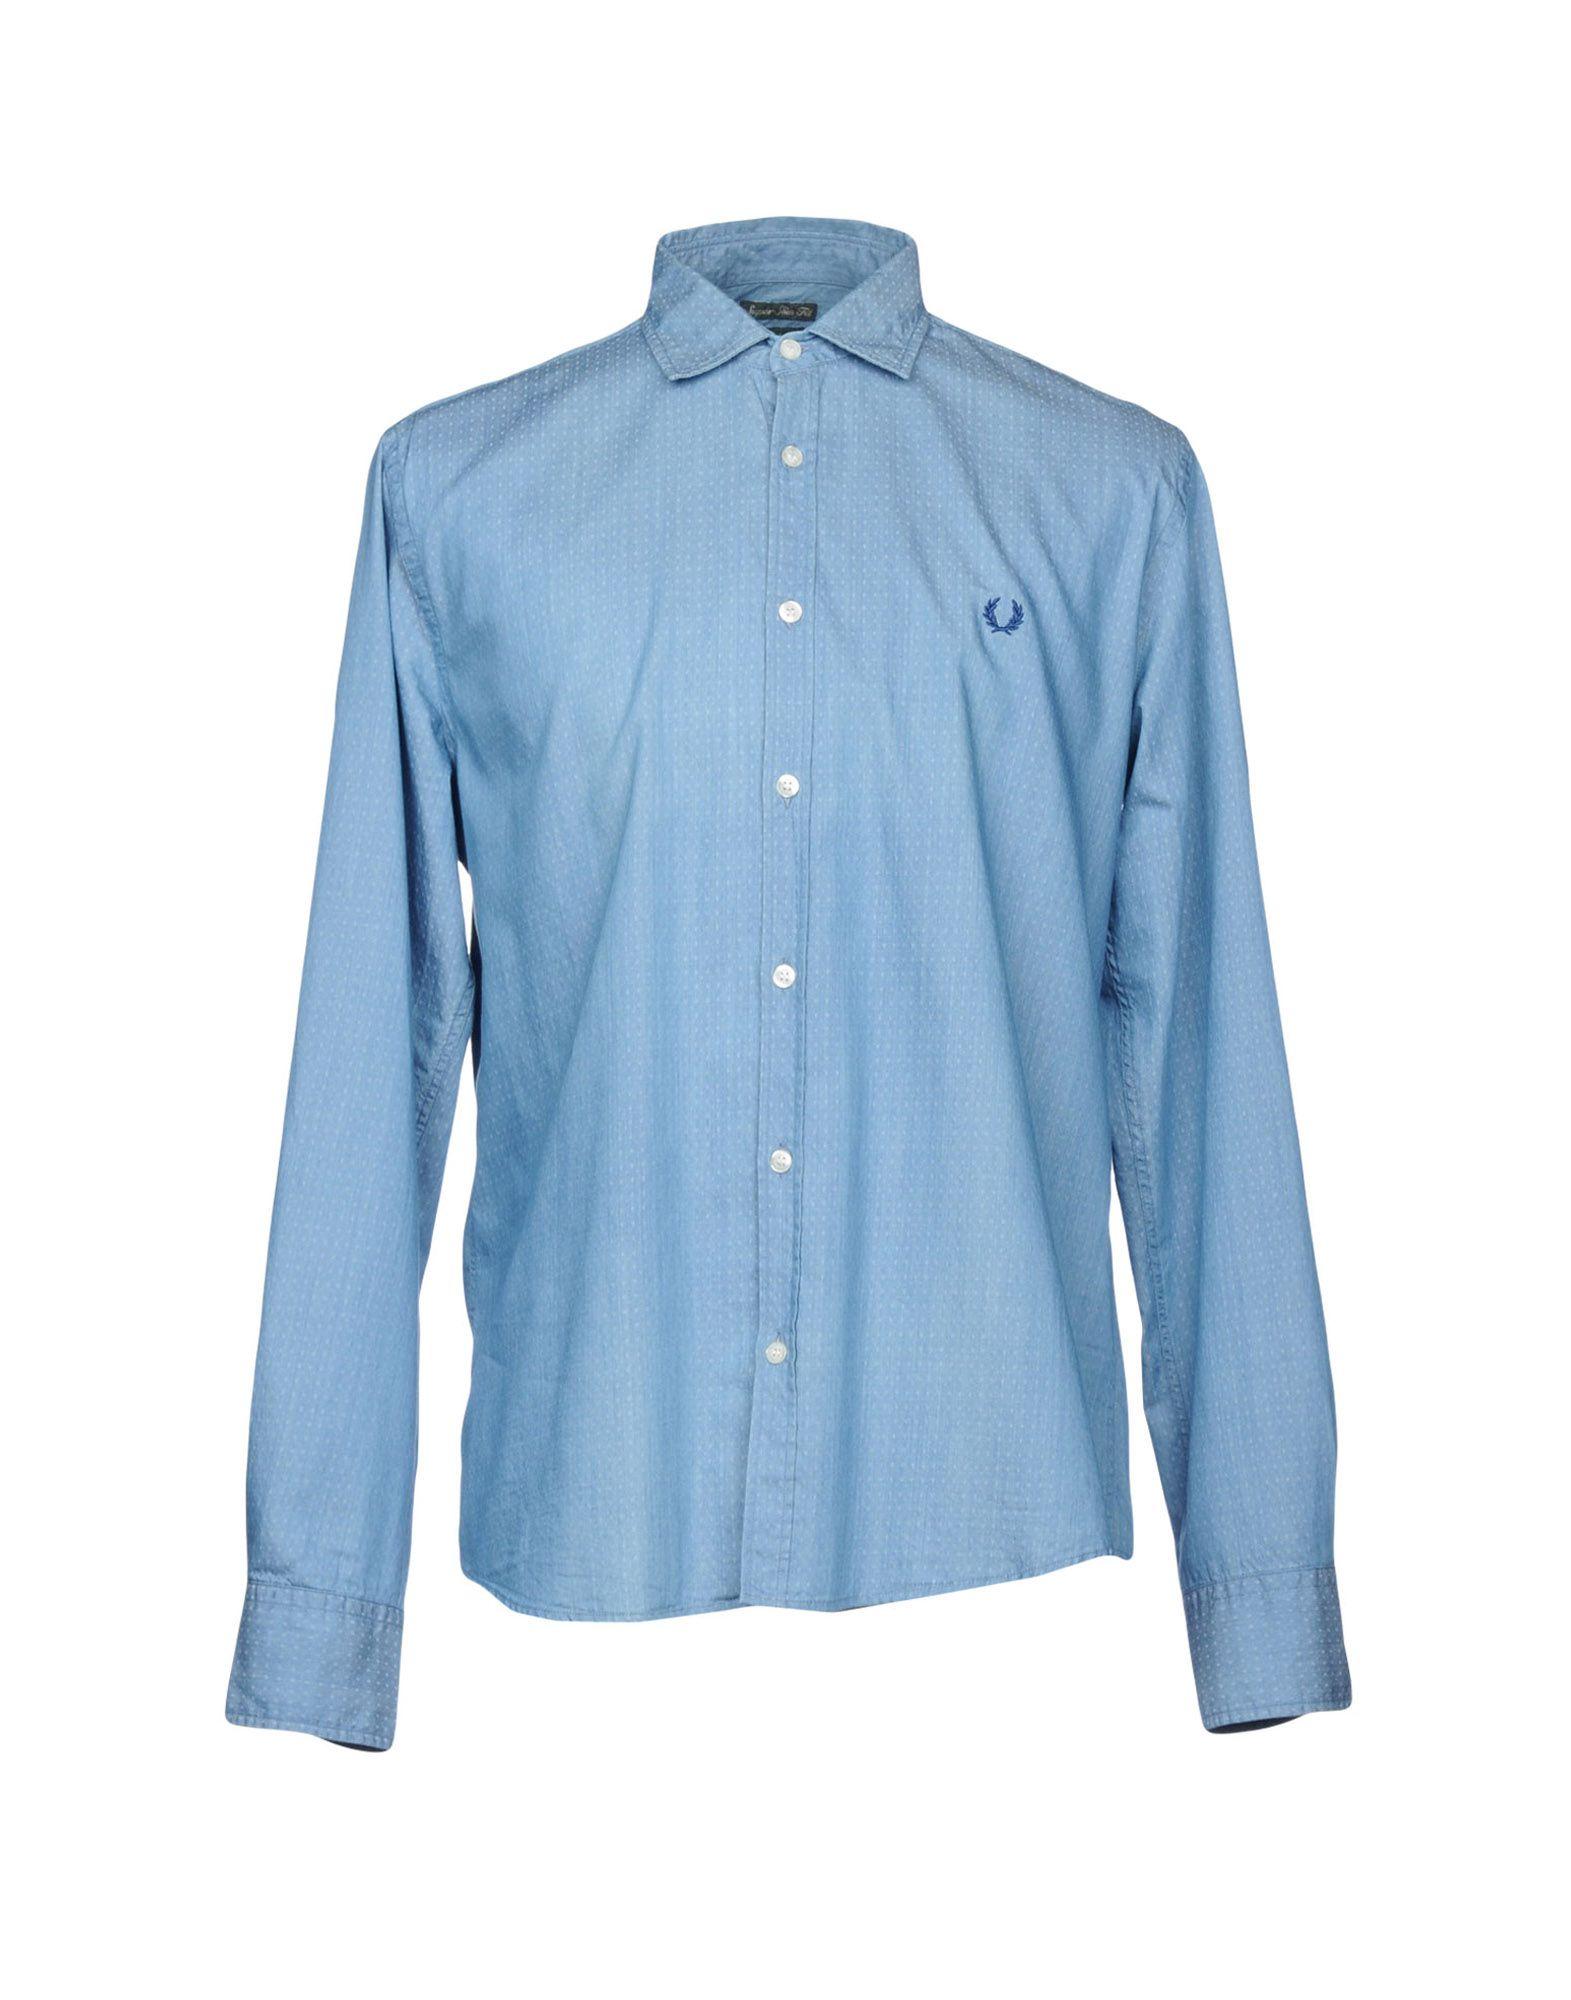 FRED PERRY Джинсовая рубашка рубашка в клетку fred perry gingham shirt long sleeve black white